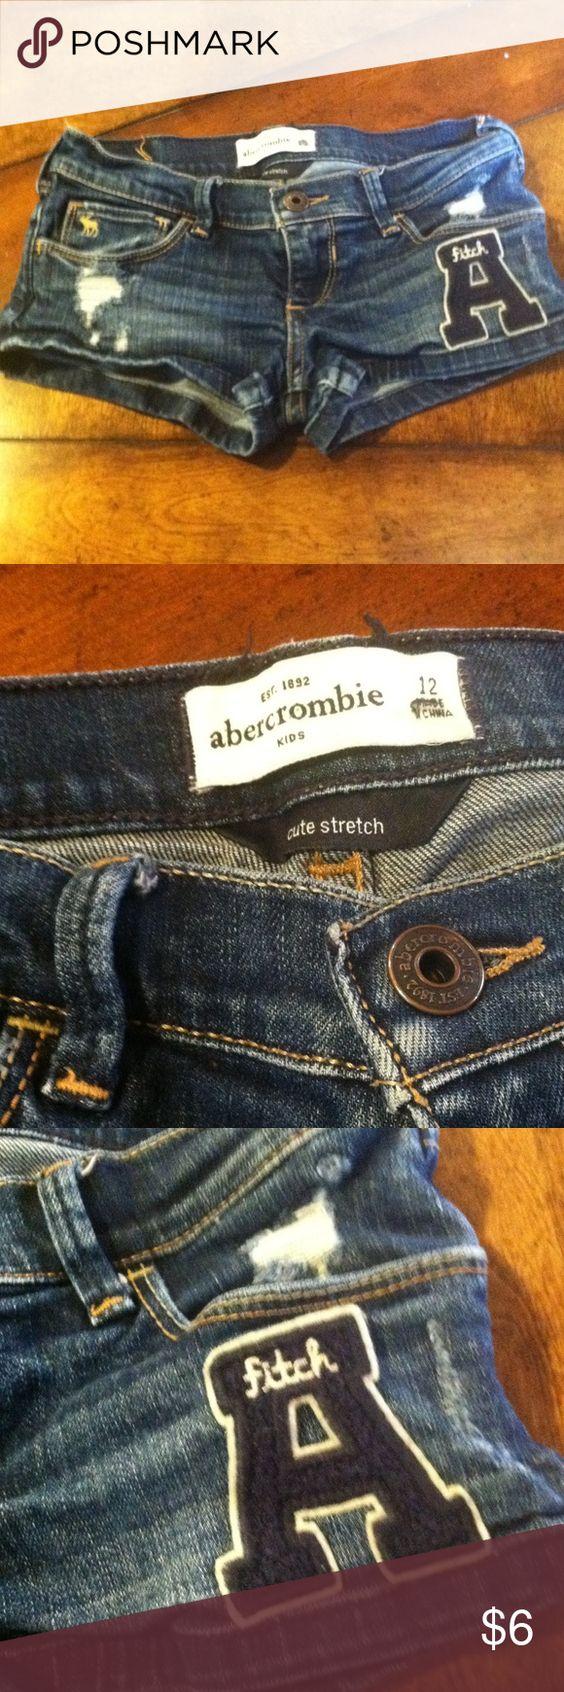 Shorts Abercrombie jean shorts girls size 12 abercrombie kids Shorts Jean Shorts